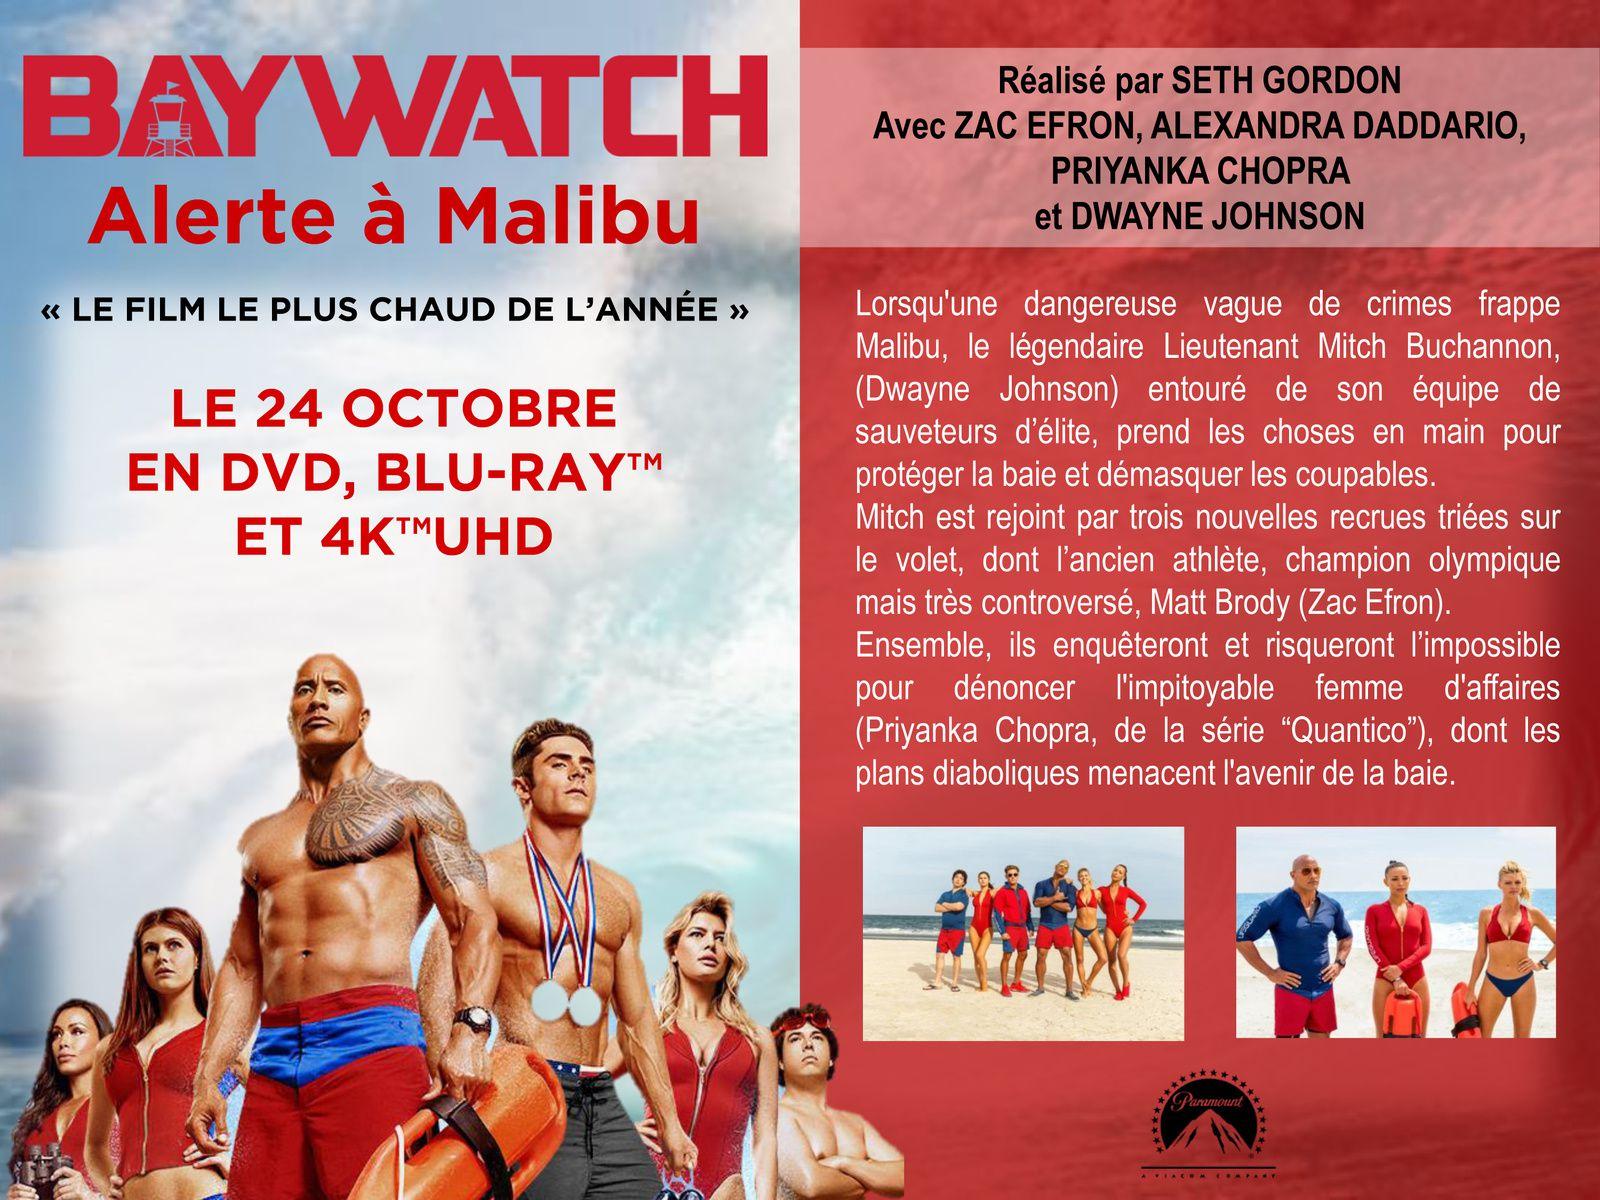 BAYWATCH - ALERTE A MALIBU, en DVD, Blu-ray™, Blu-ray™ 4K UHD le 14 octobre chez Universal Pictures Vidéo